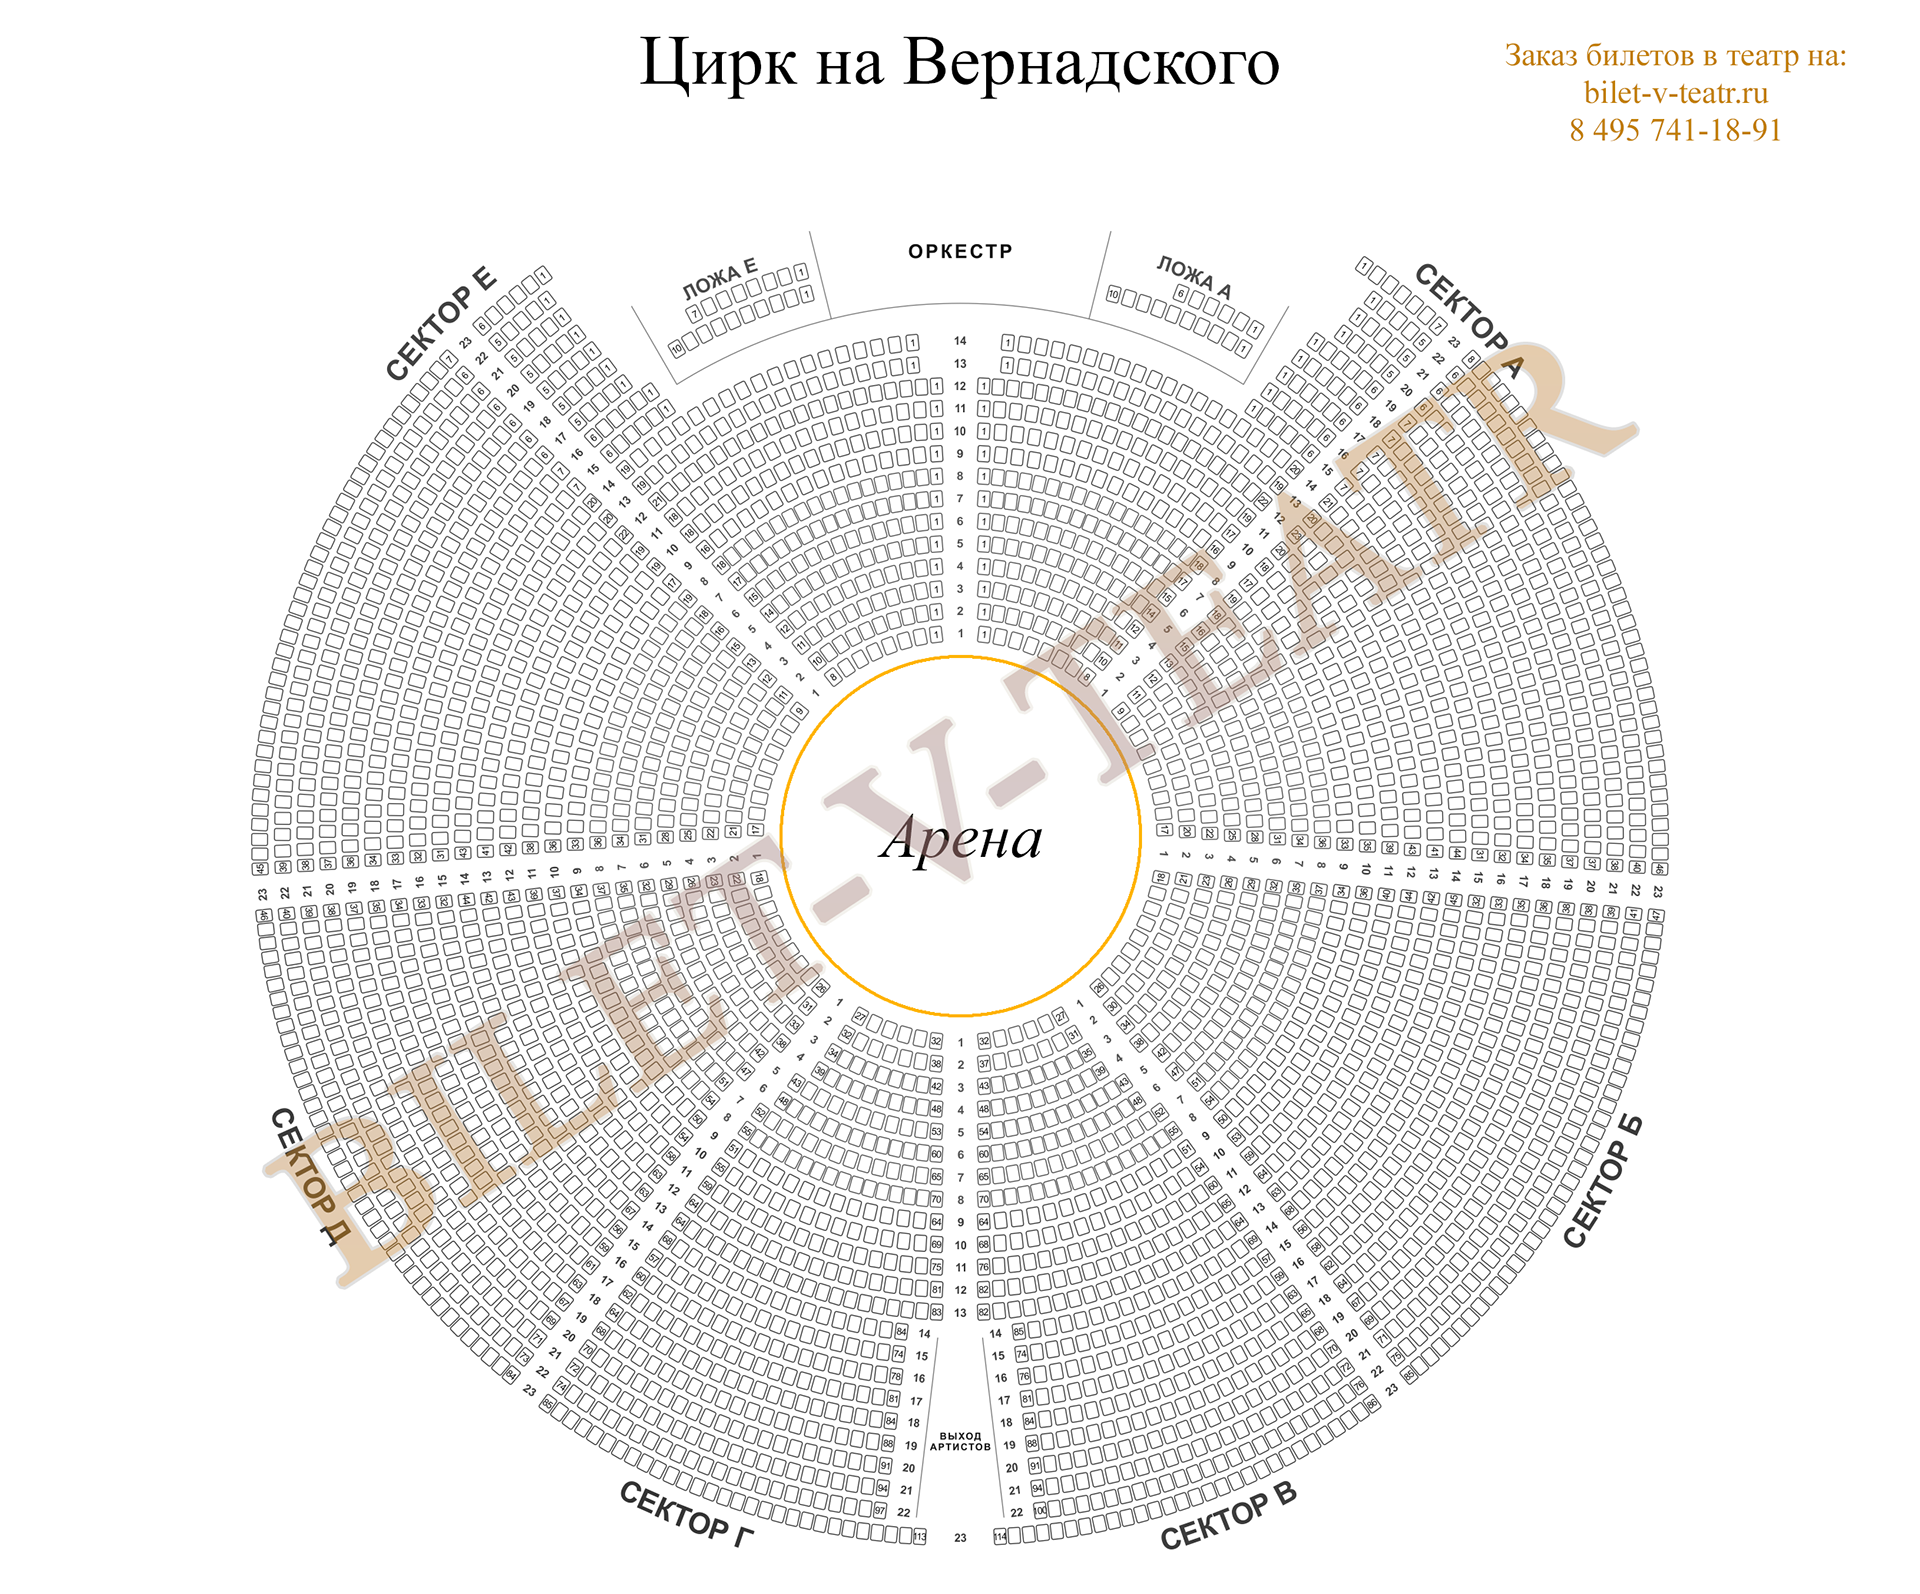 Цирк схема зала на проспекте вернадского